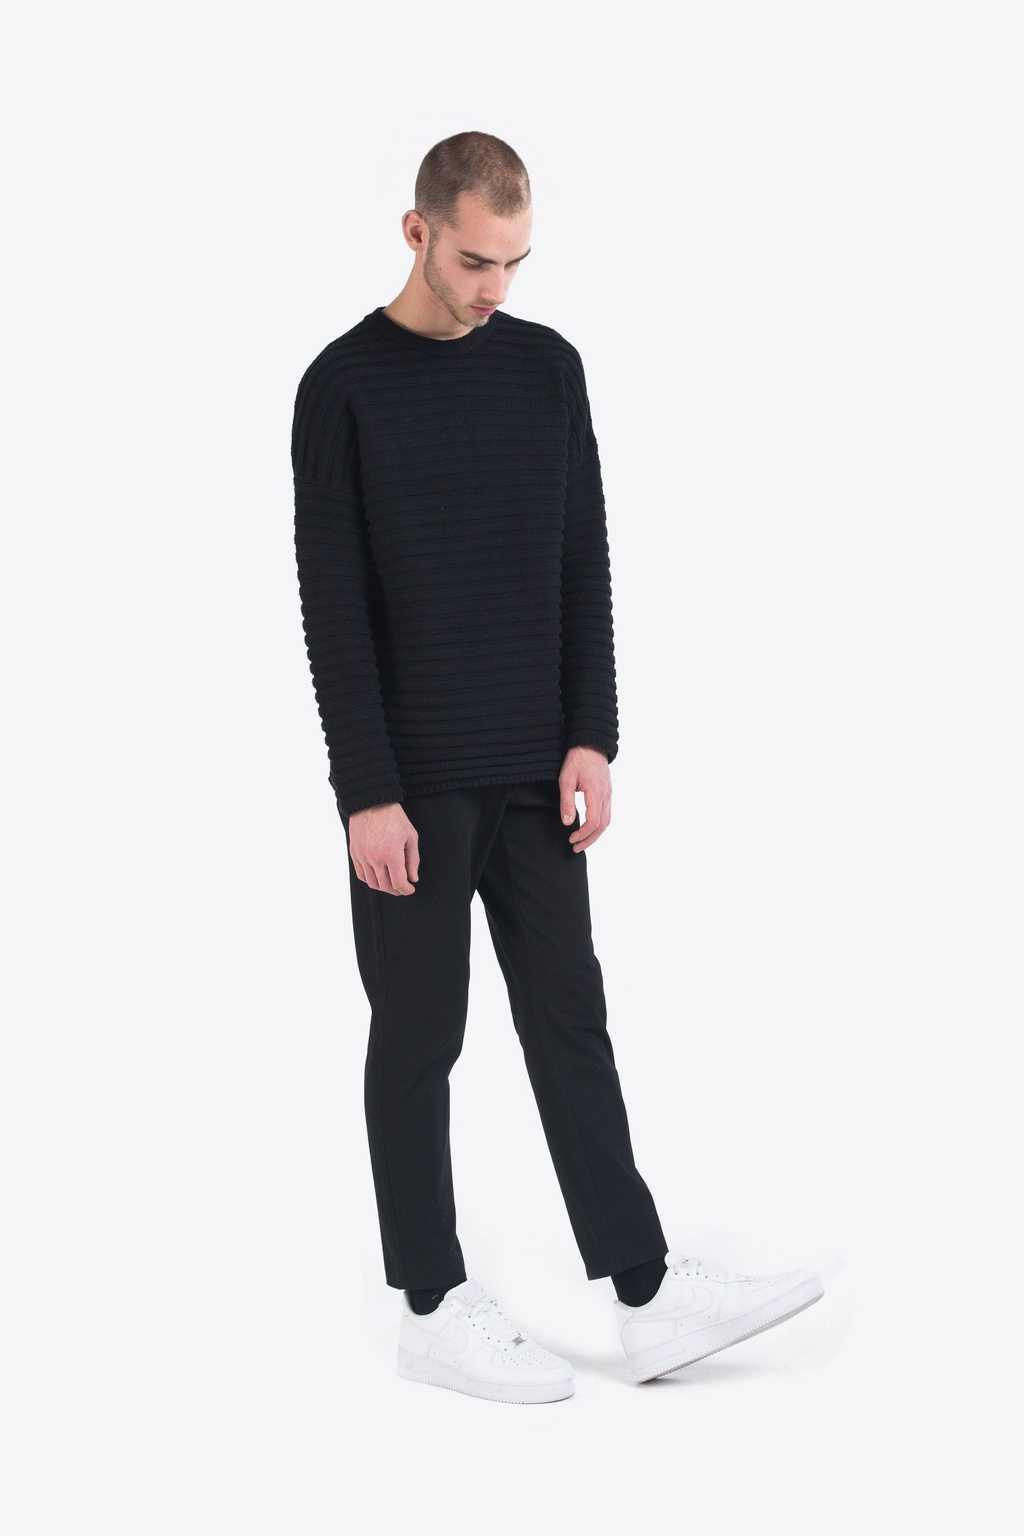 Sweater 7226 Black 6